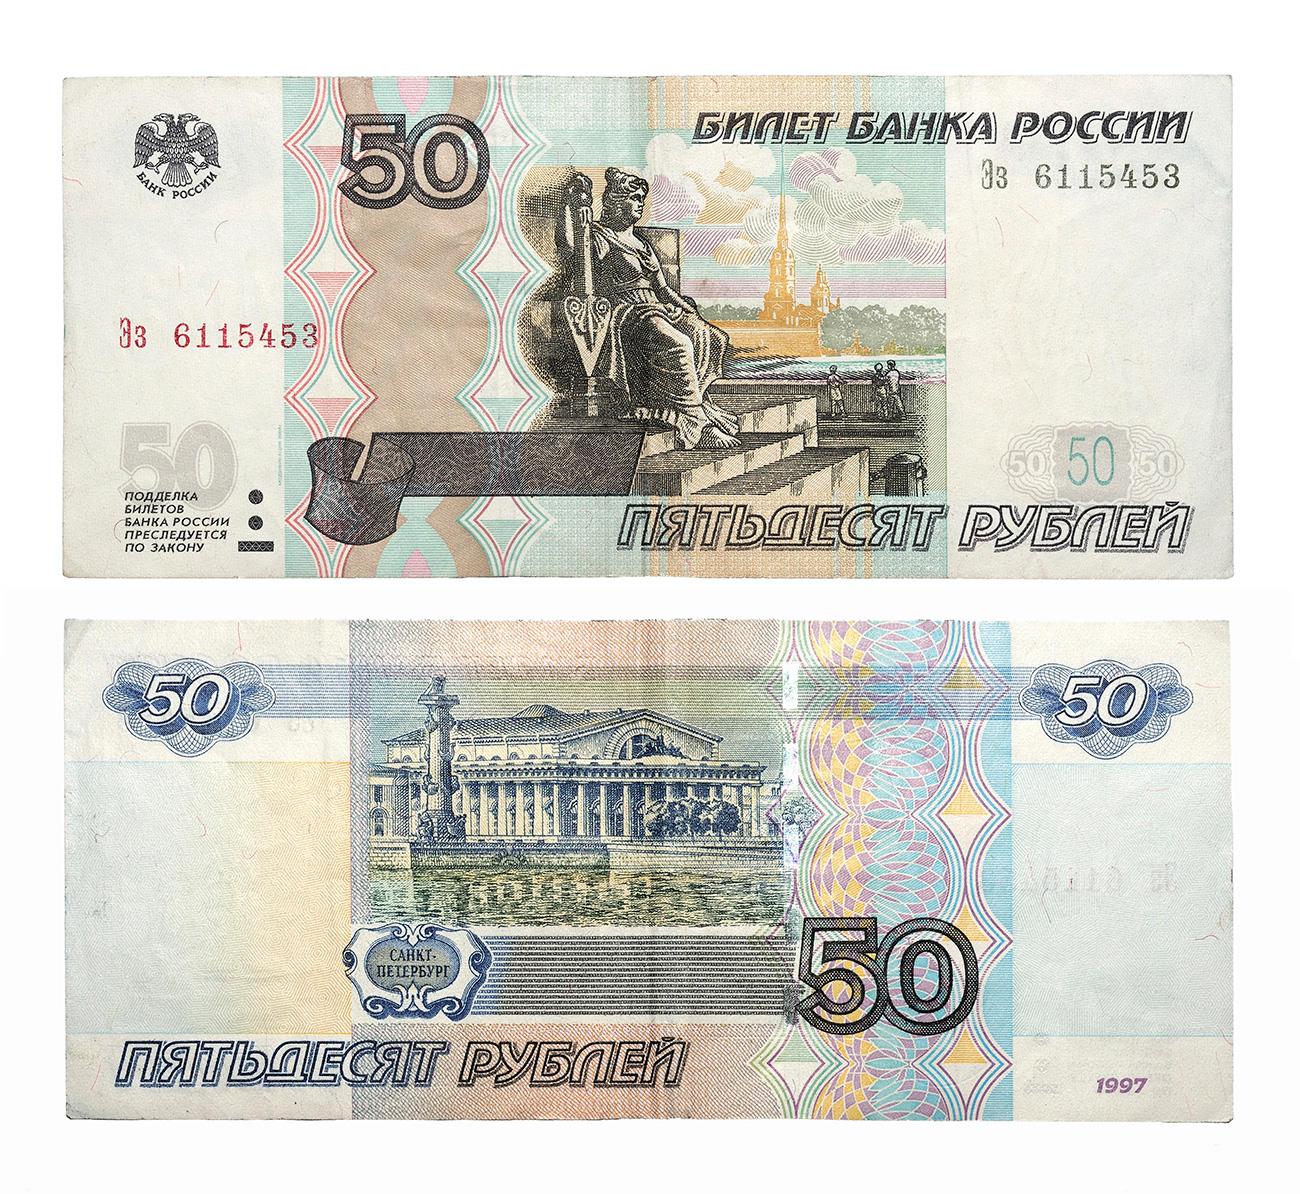 50 rubles / Global Look Press